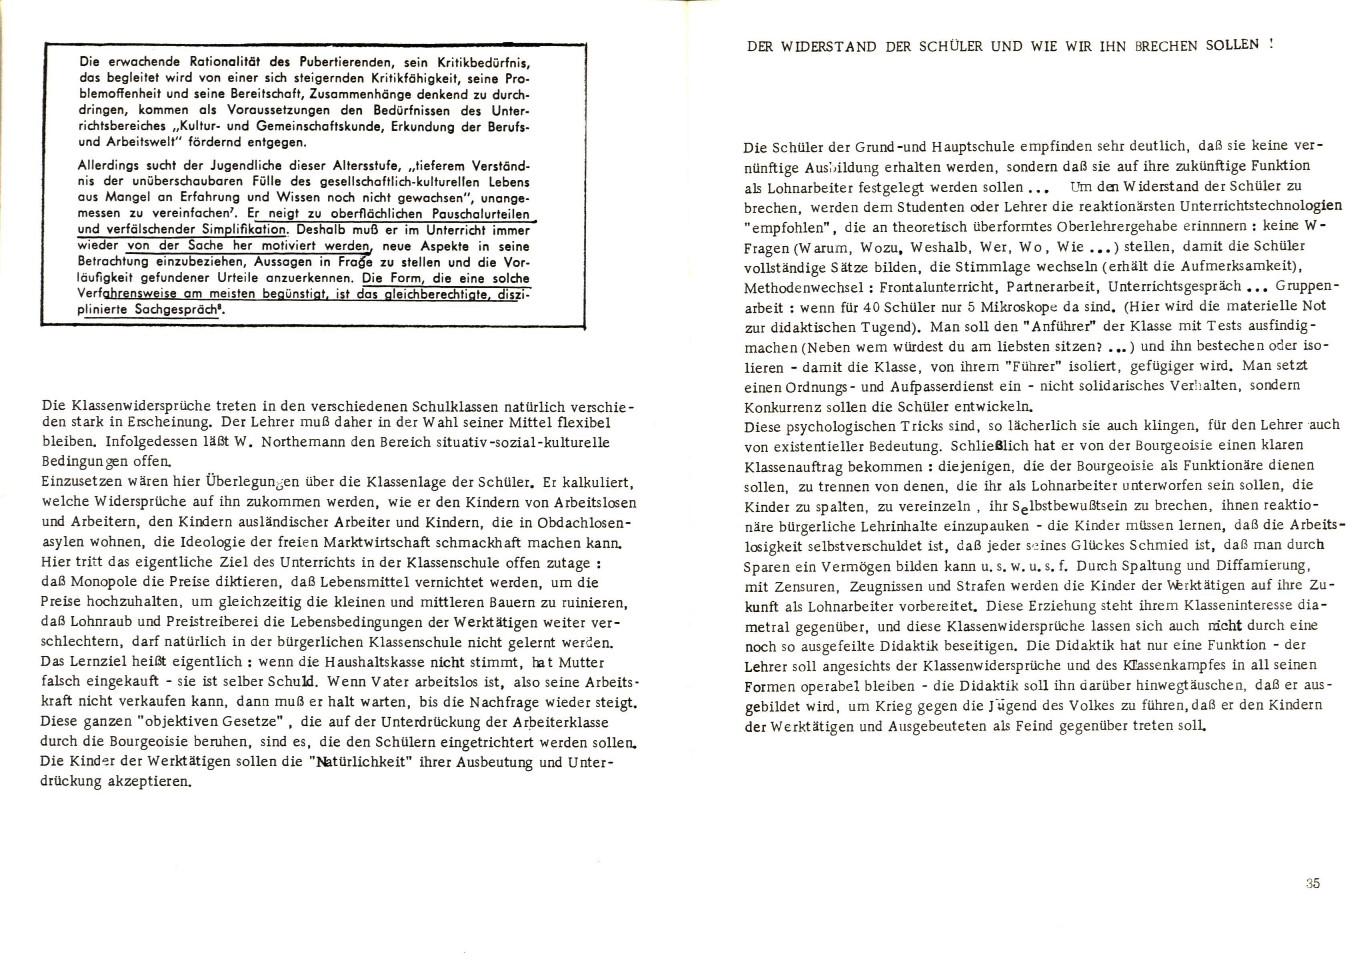 KSV_1975_Lehrerausbildung_18